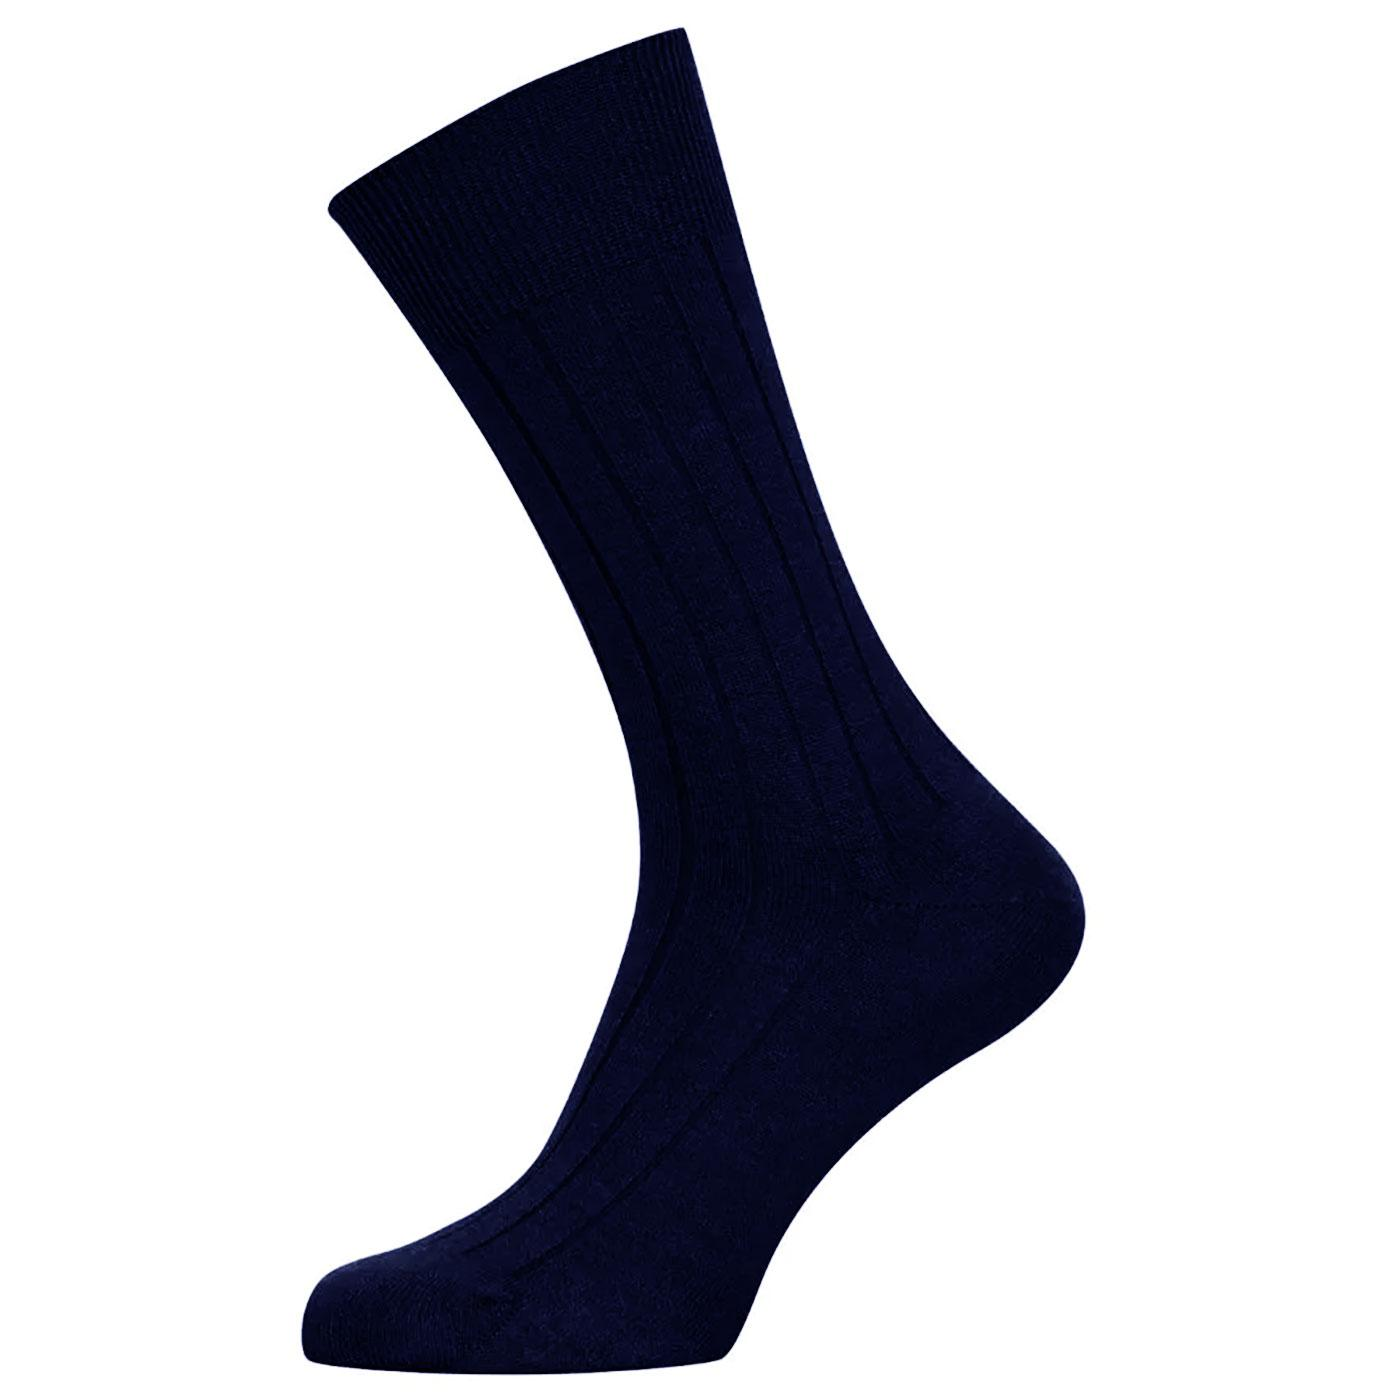 + Cira JOHN SMEDLEY Cotton & Wool Blend Socks N